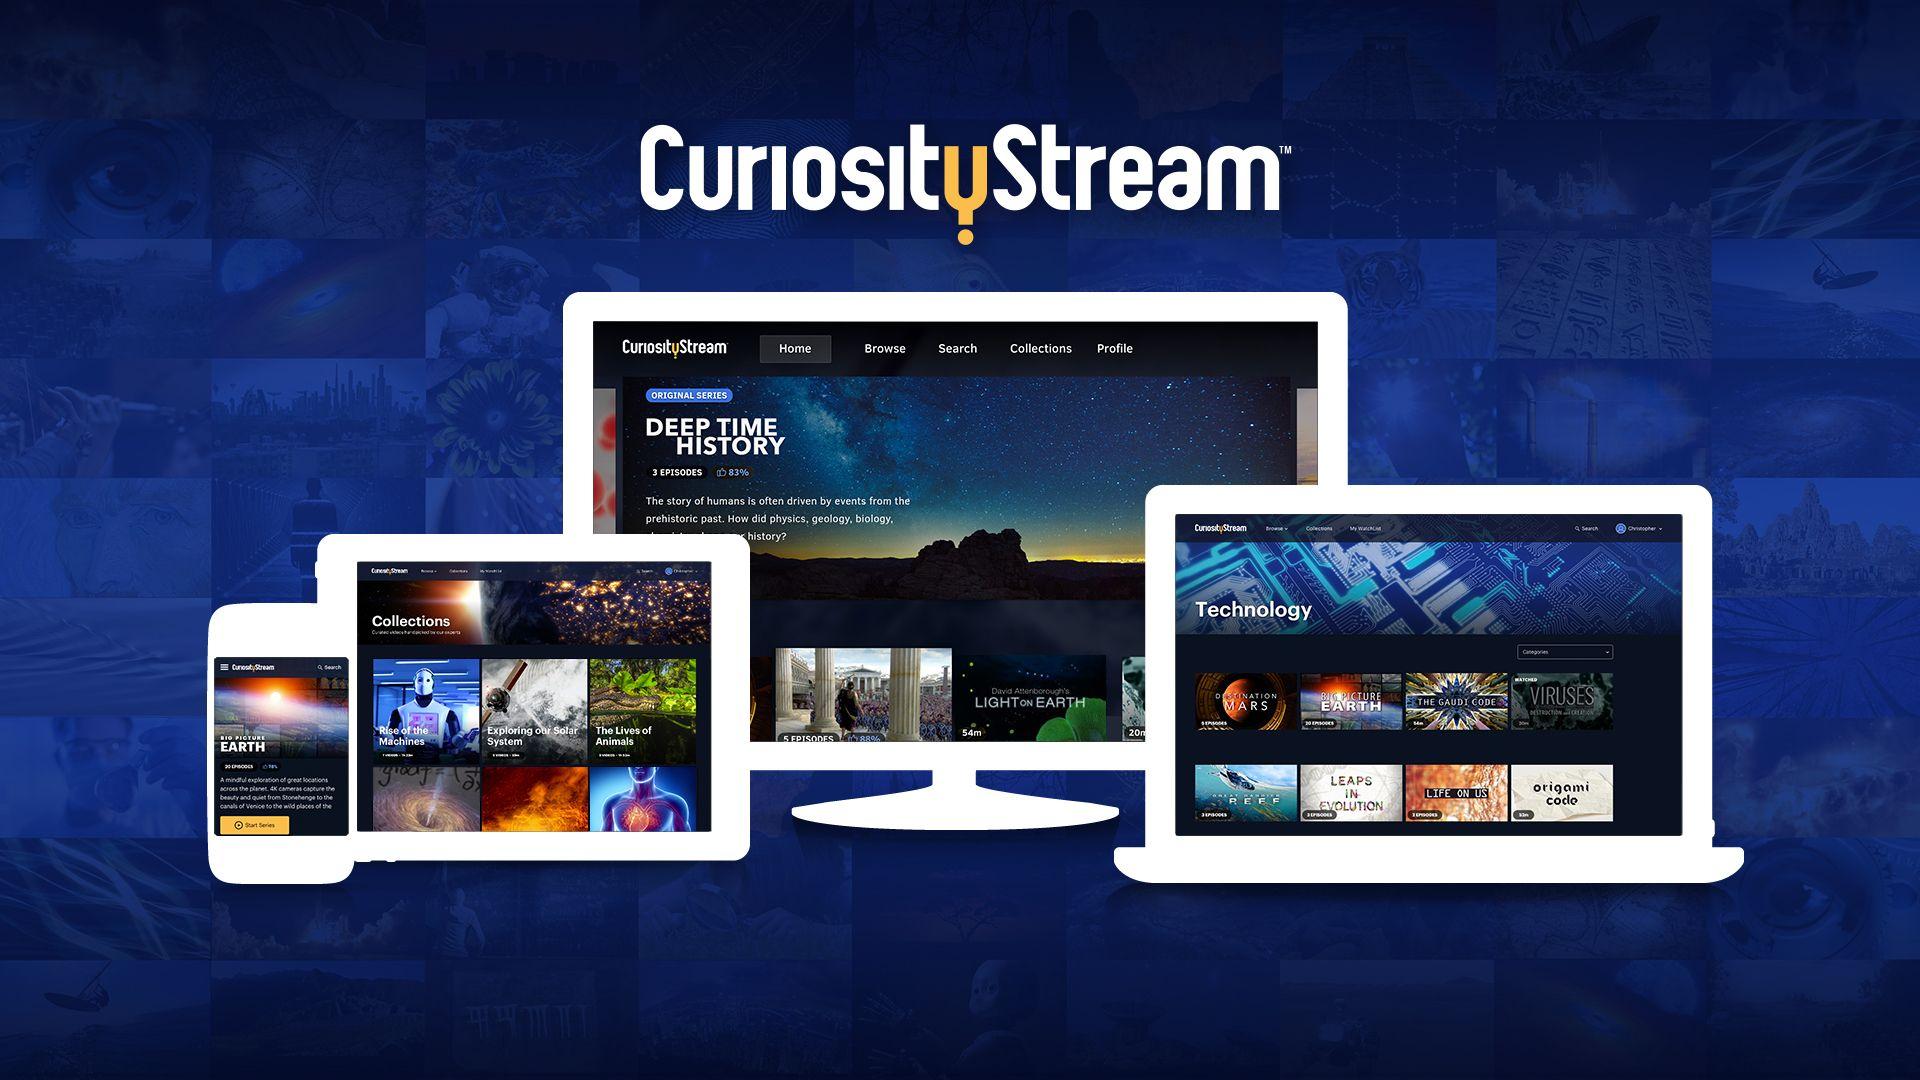 VRV Adds MUBI, CuriosityStream, and Offline Viewing | Collider